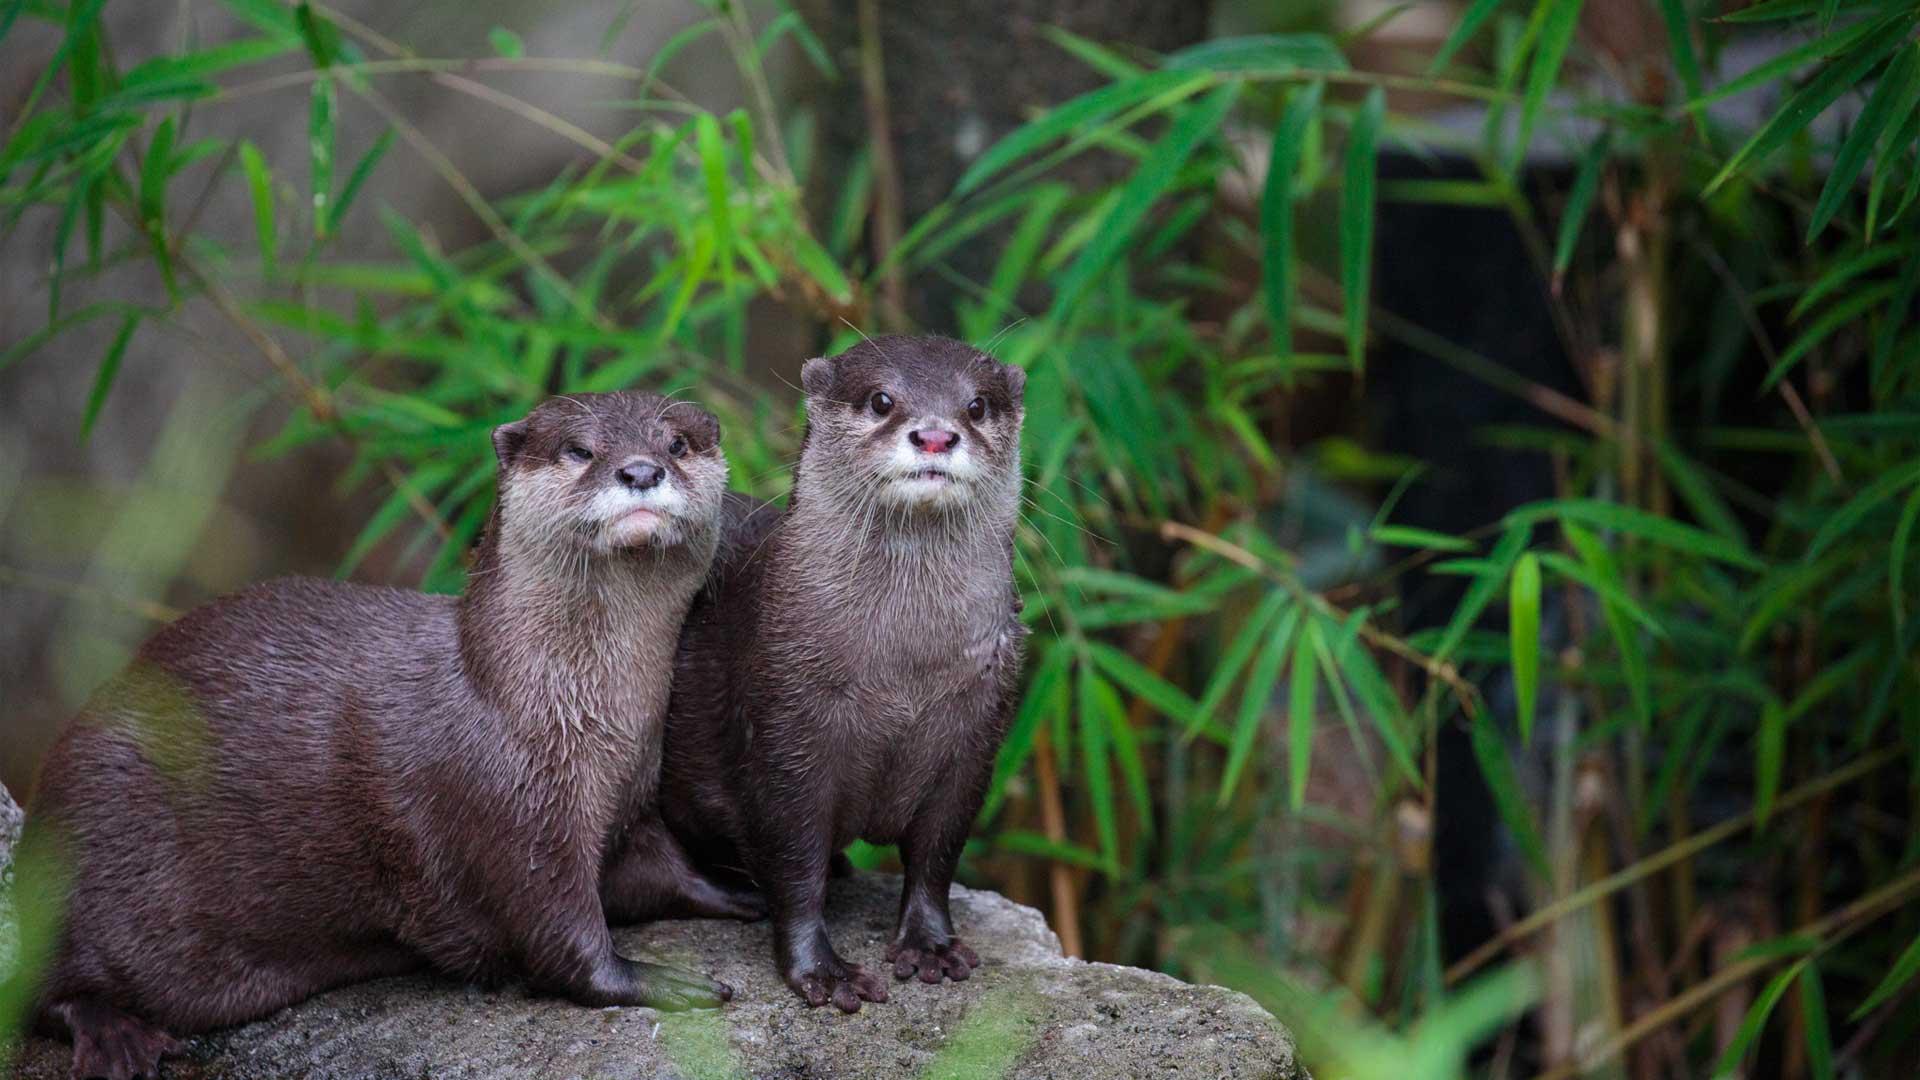 https://rfacdn.nz/zoo/assets/media/otter-gallery-1.jpg